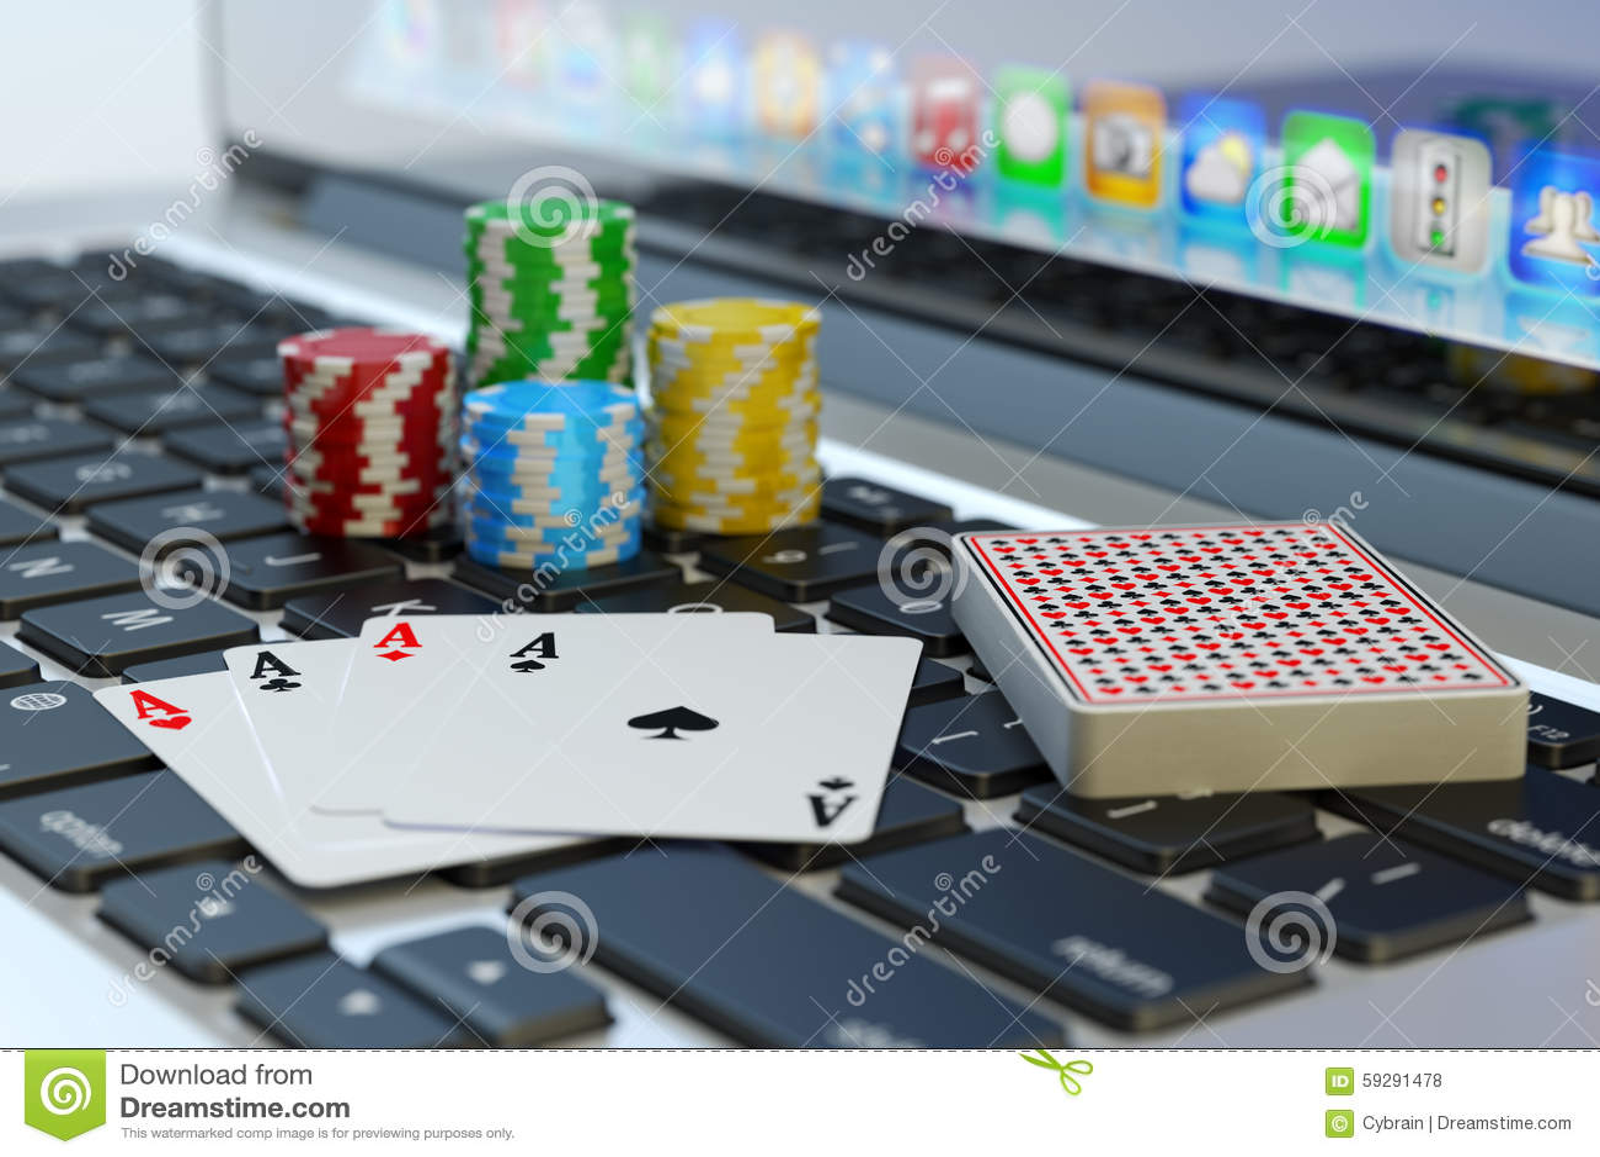 casino online poker